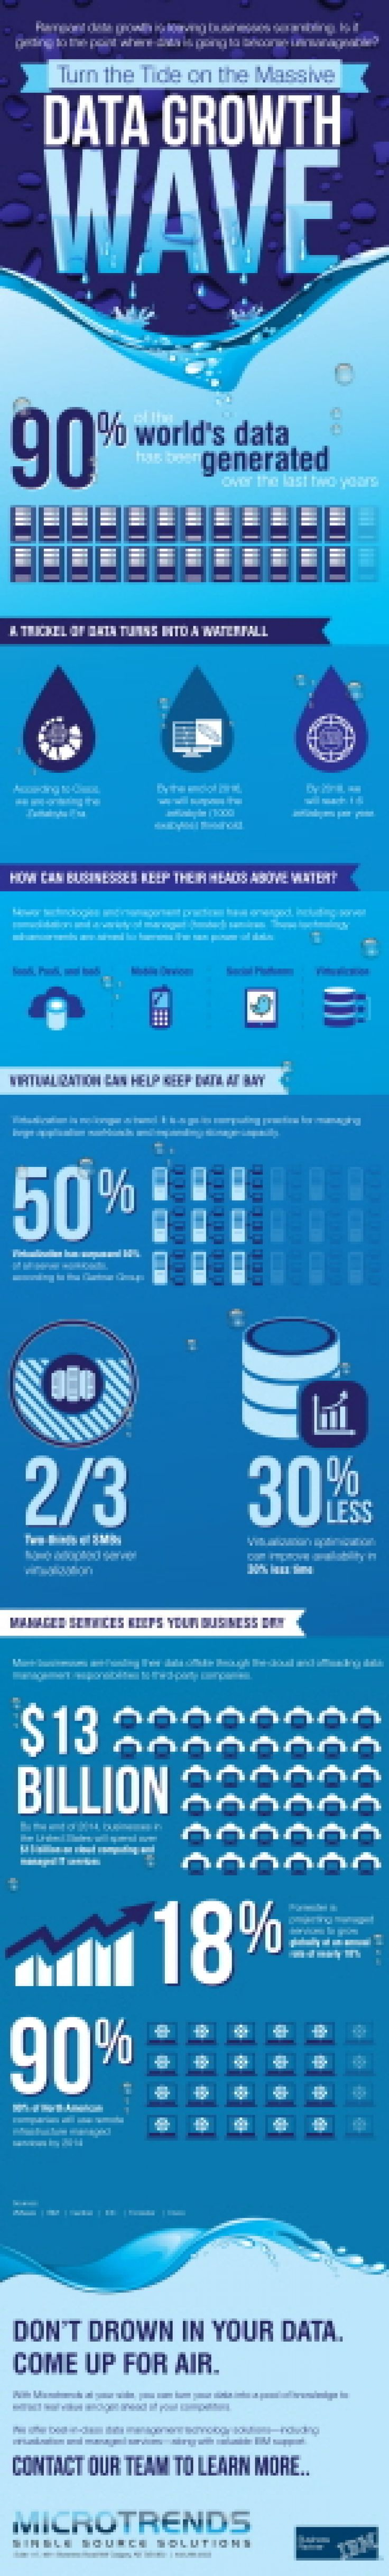 The Data Wave Growth #BigData